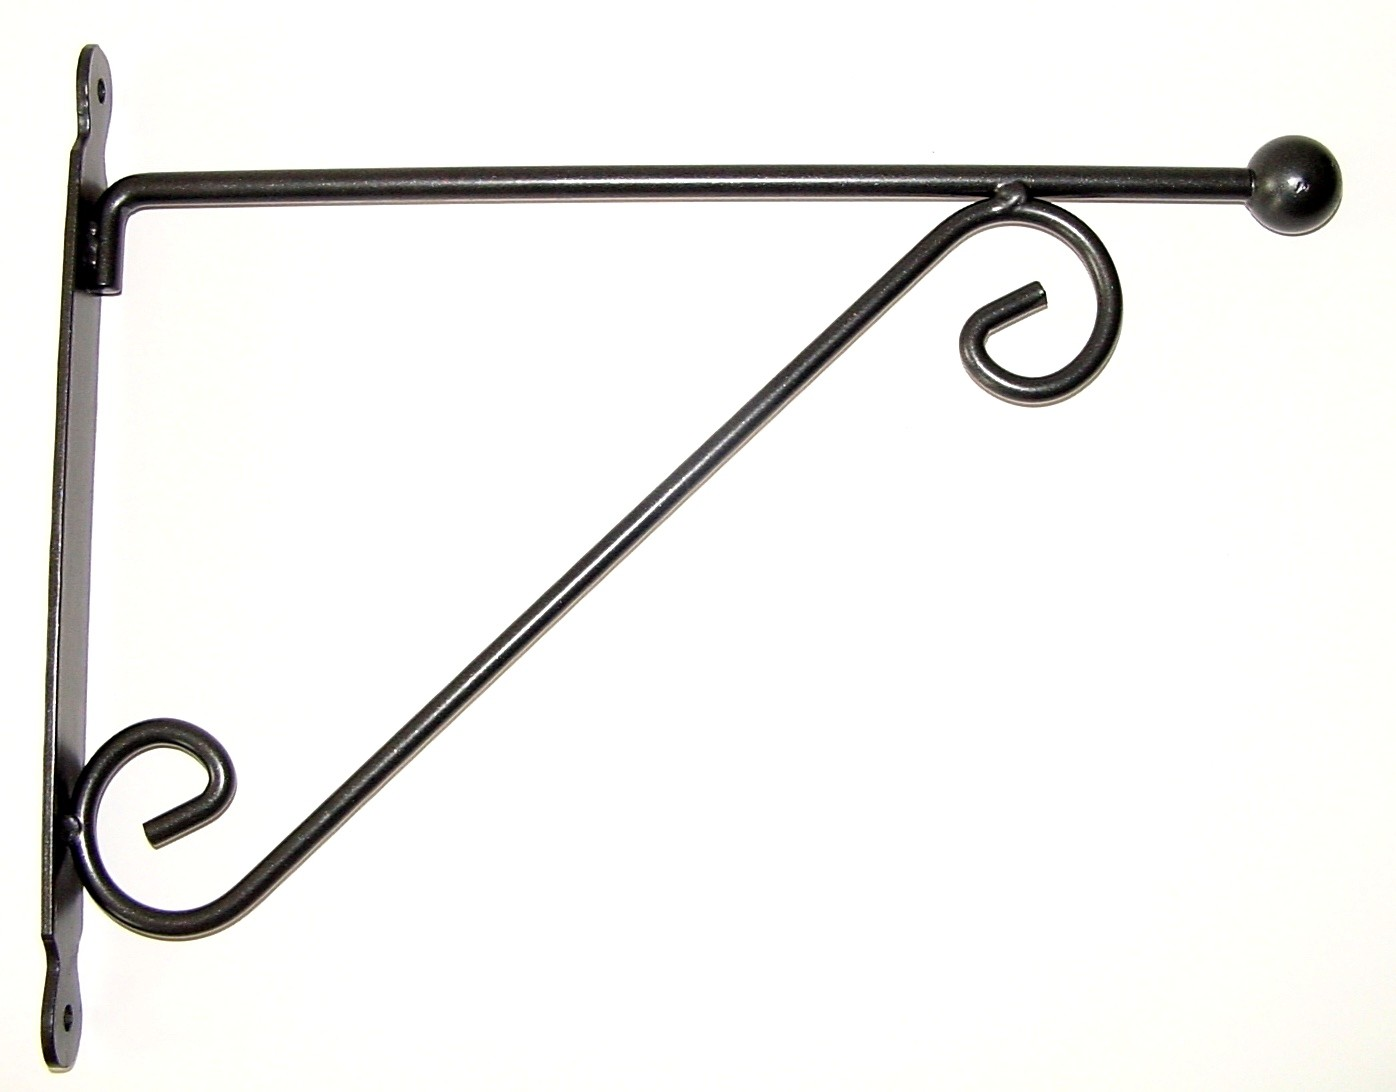 Bloembak Muurhaak bol antraciet 39 cm Nnice